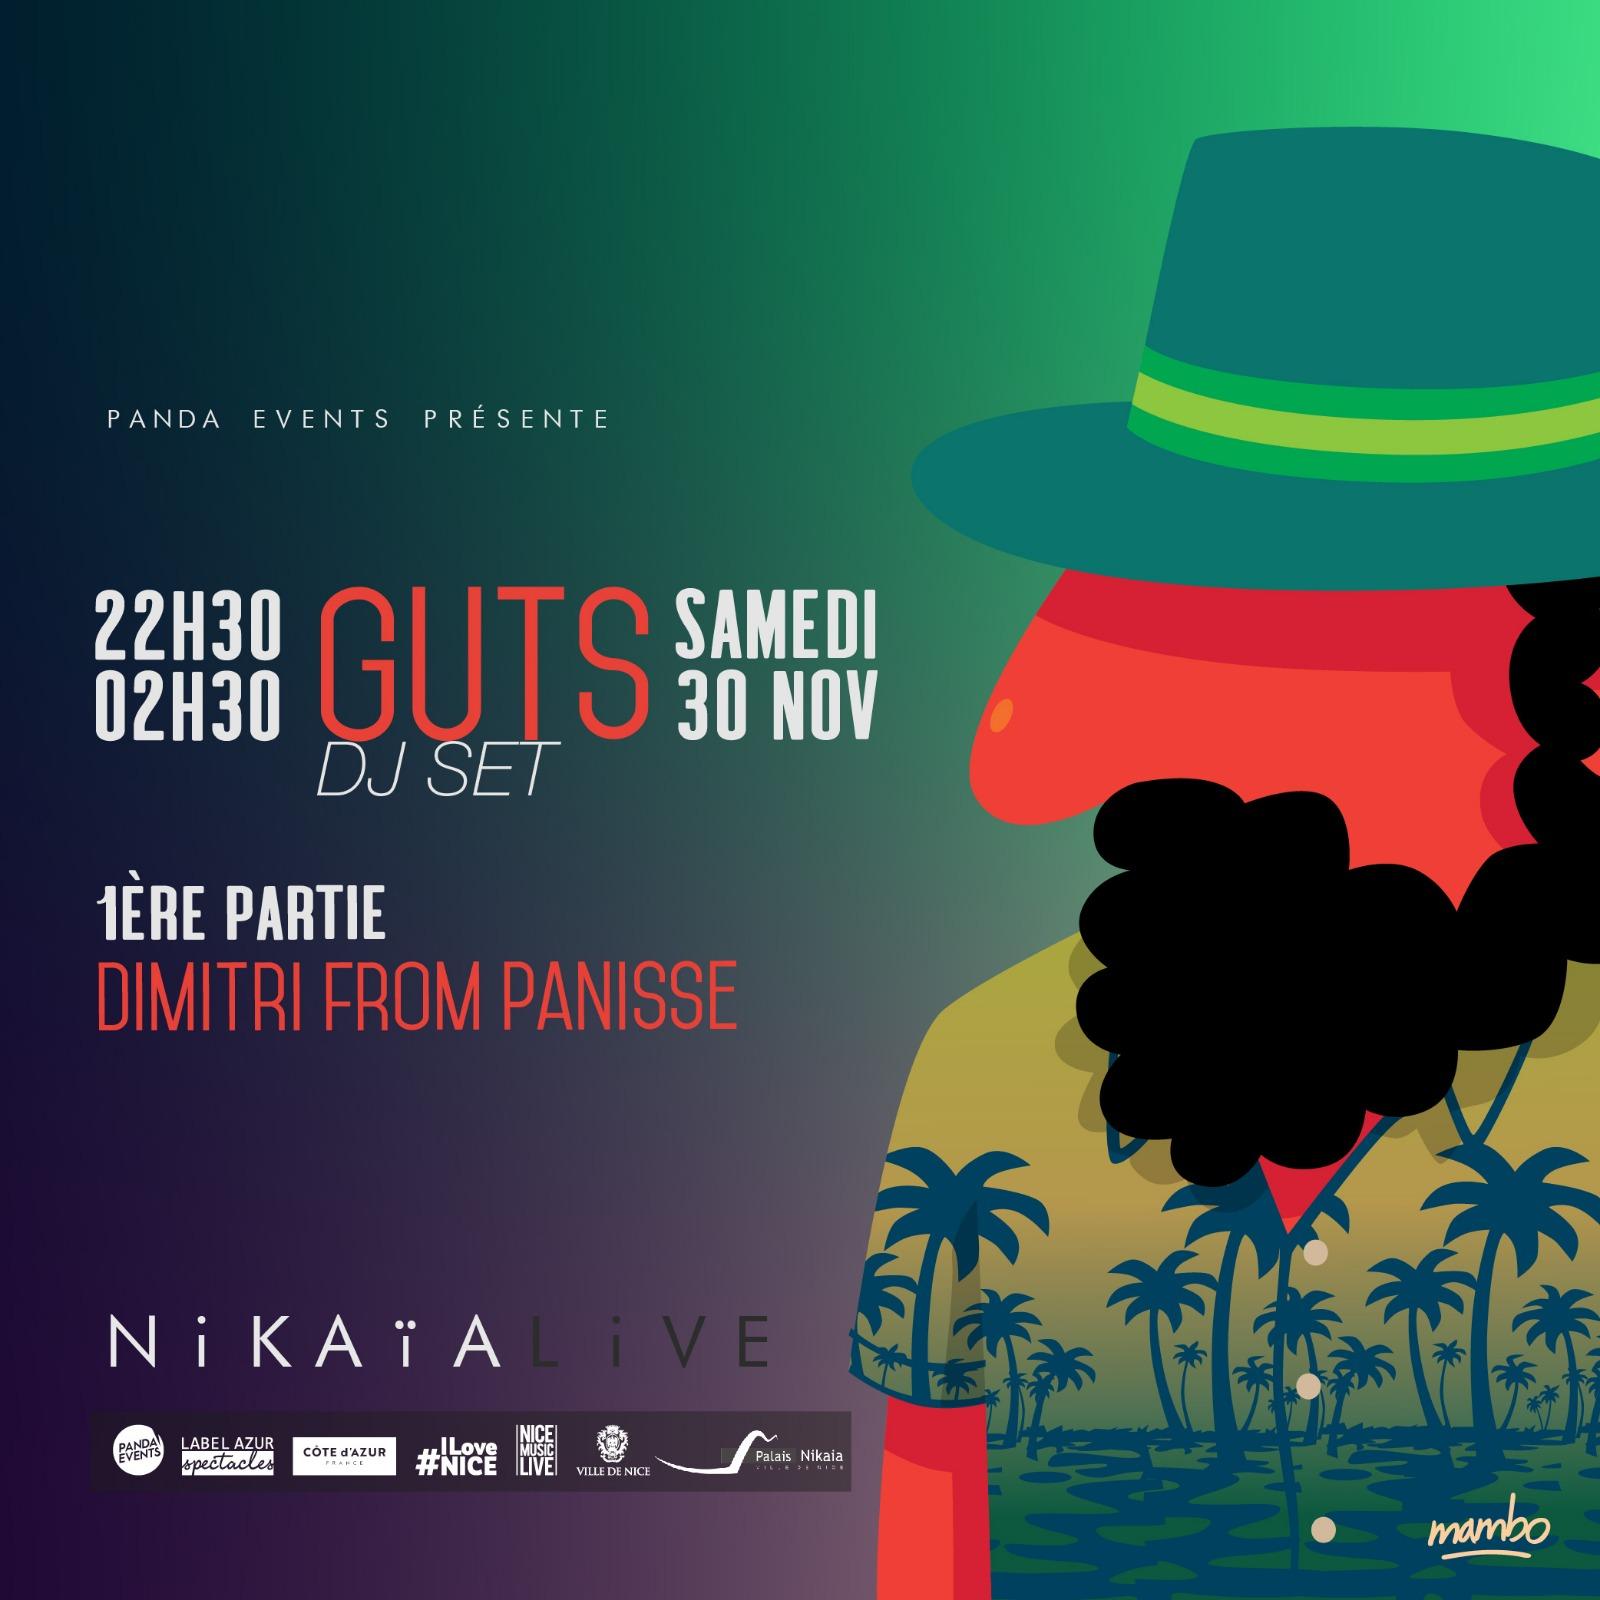 GUTS (DJ Set) + DIMITRI FROM PANISSE